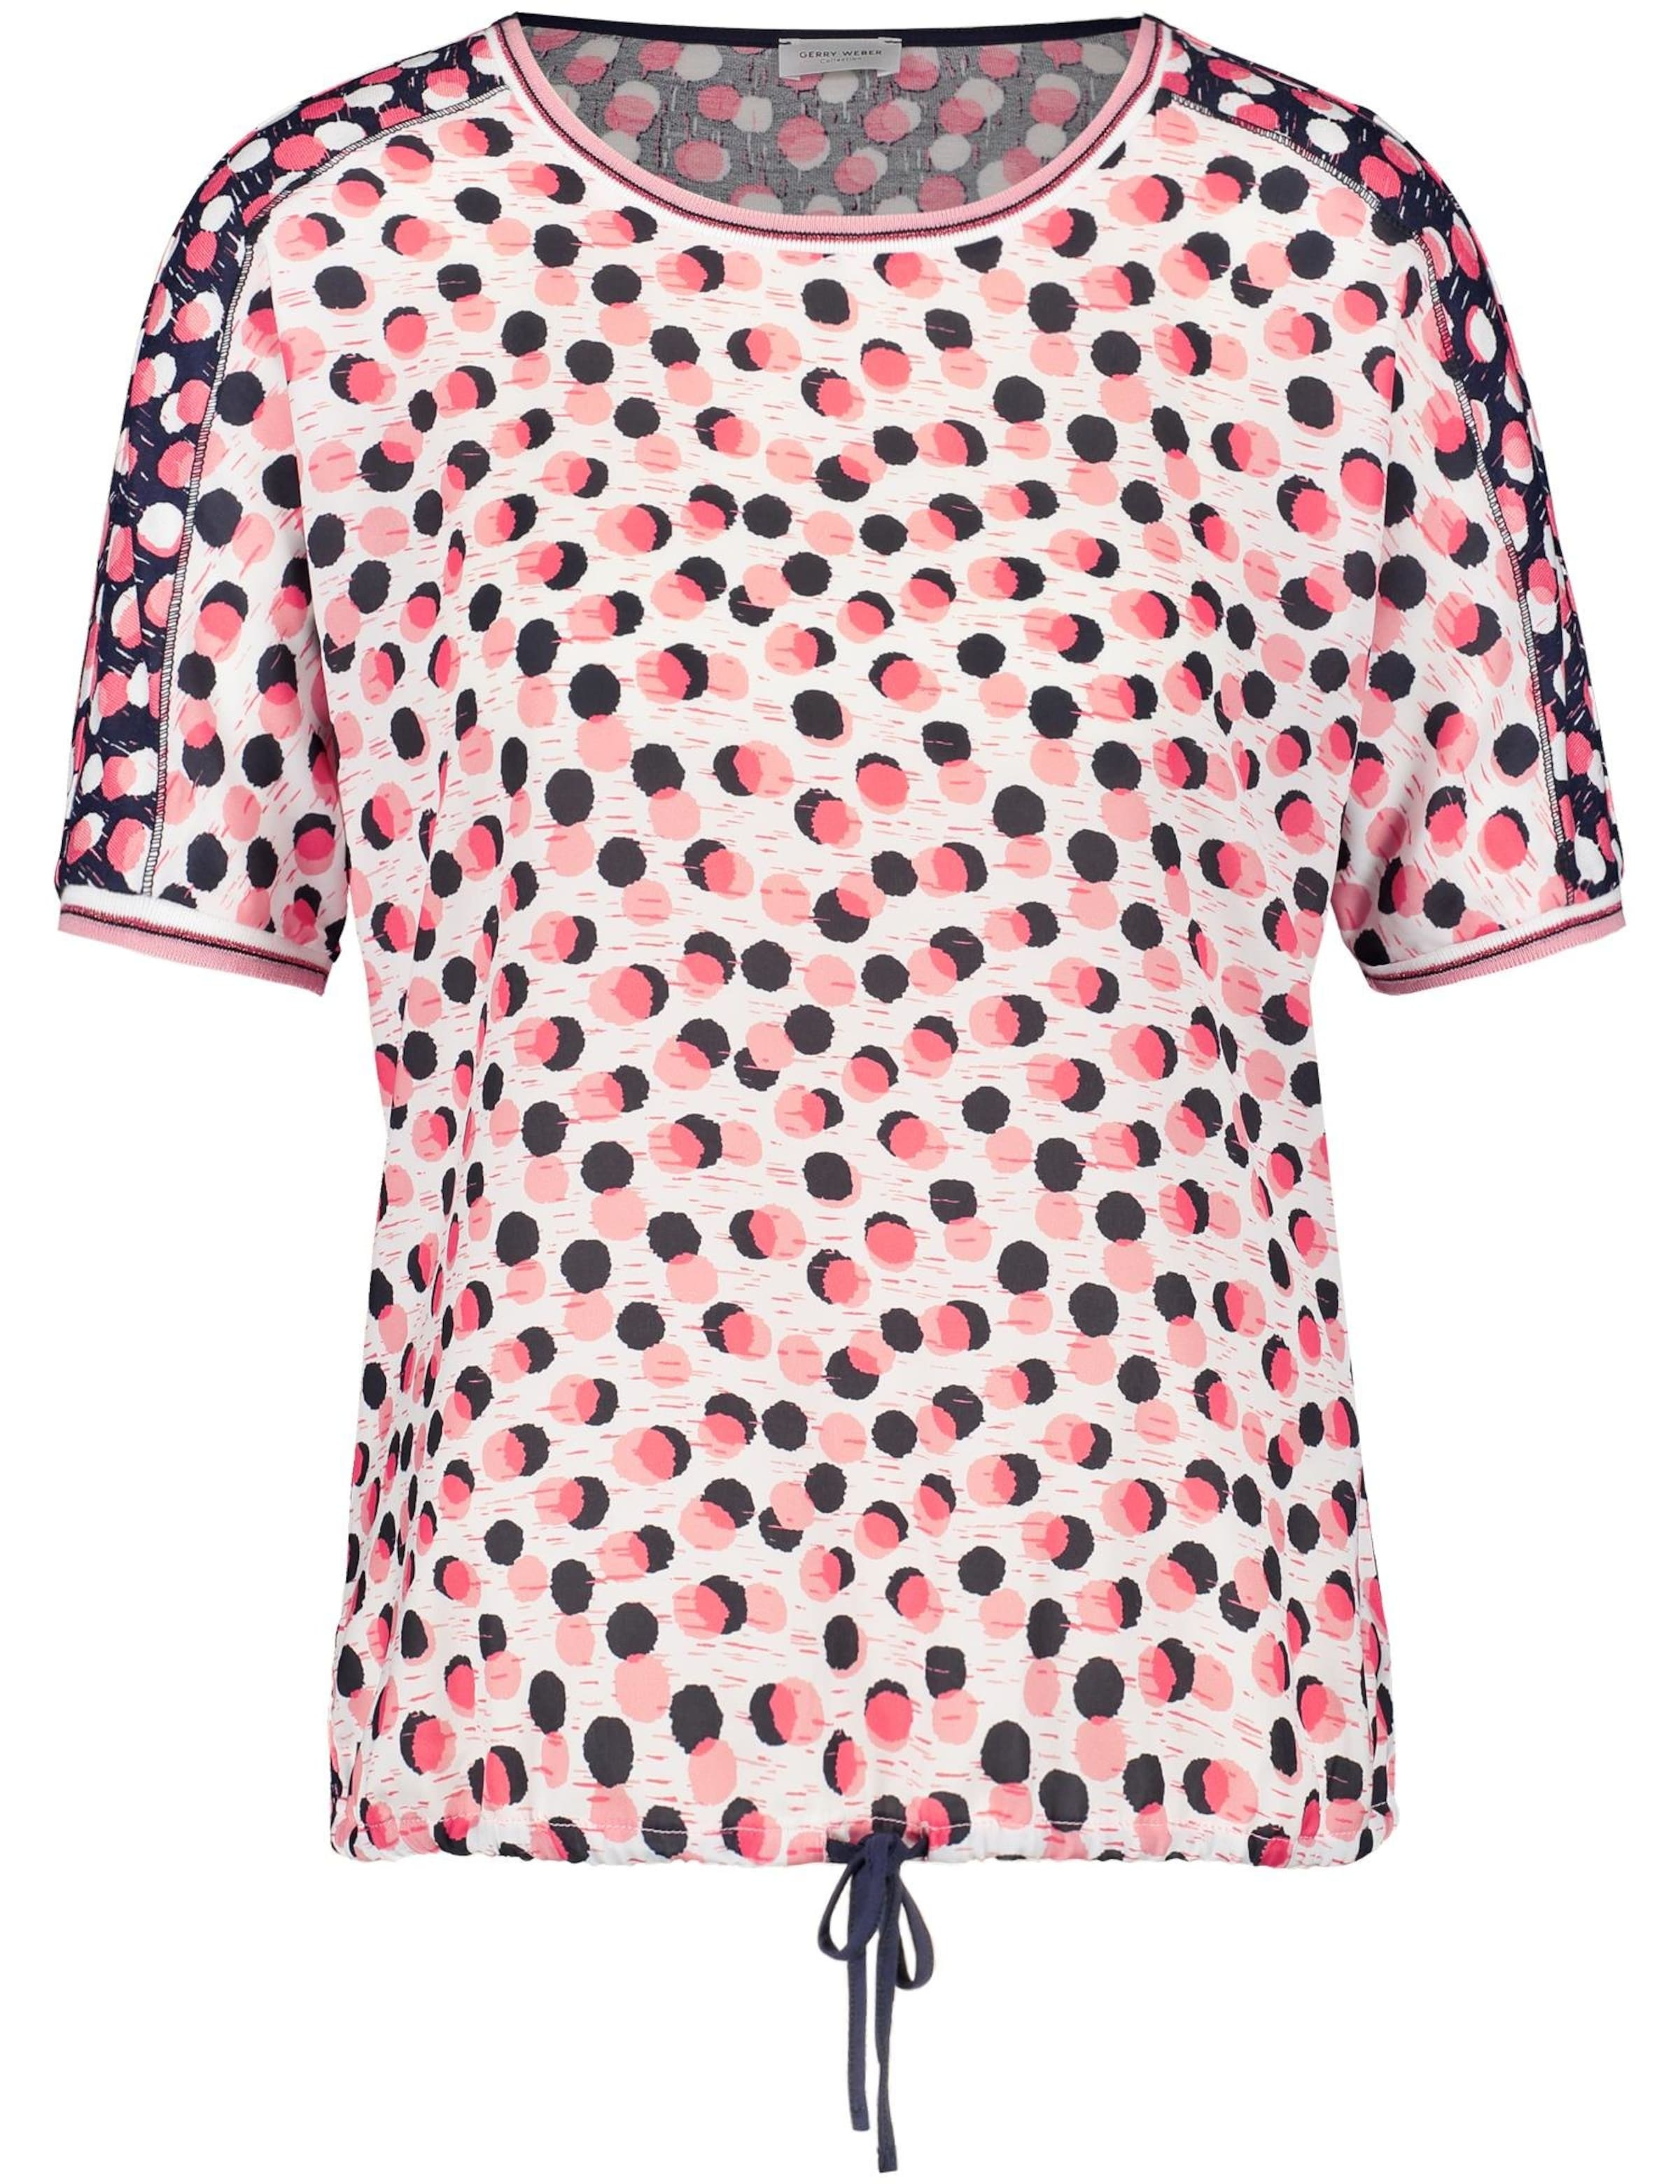 shirt Rot Gerry Weber BlauRosa In T NyOnm8wv0